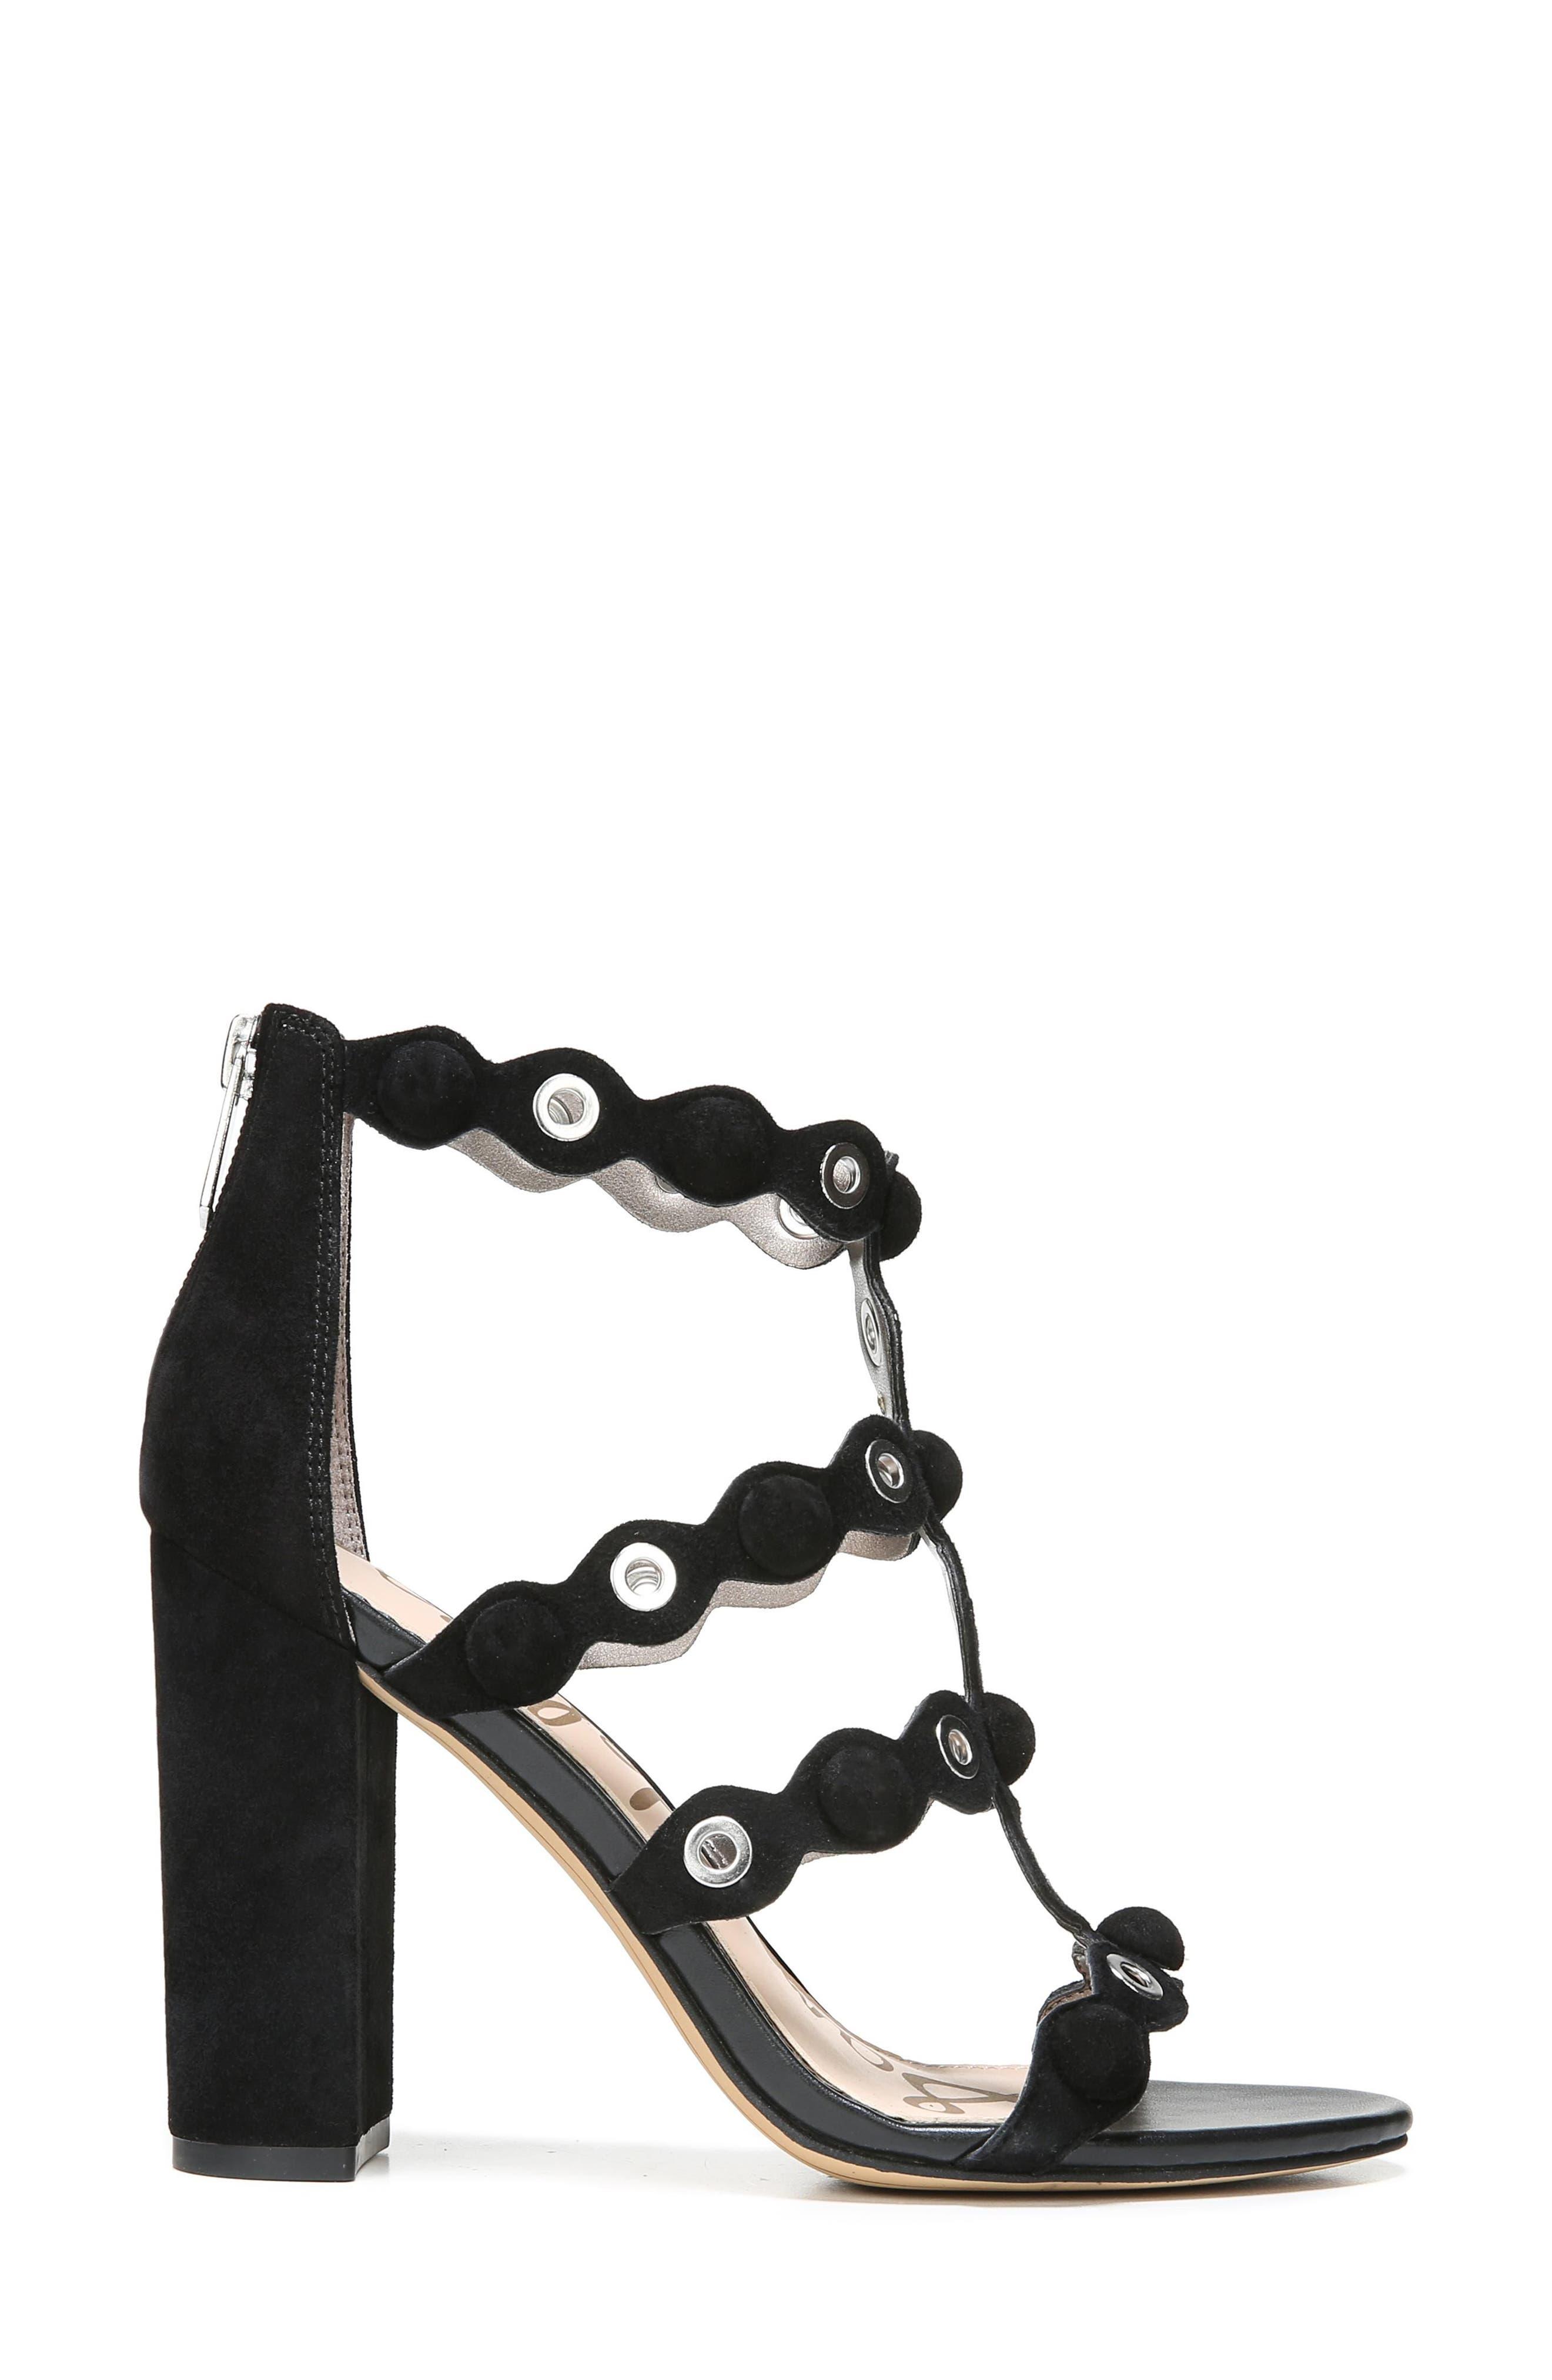 Yuli Grommet Sandal,                             Alternate thumbnail 3, color,                             Black Leather